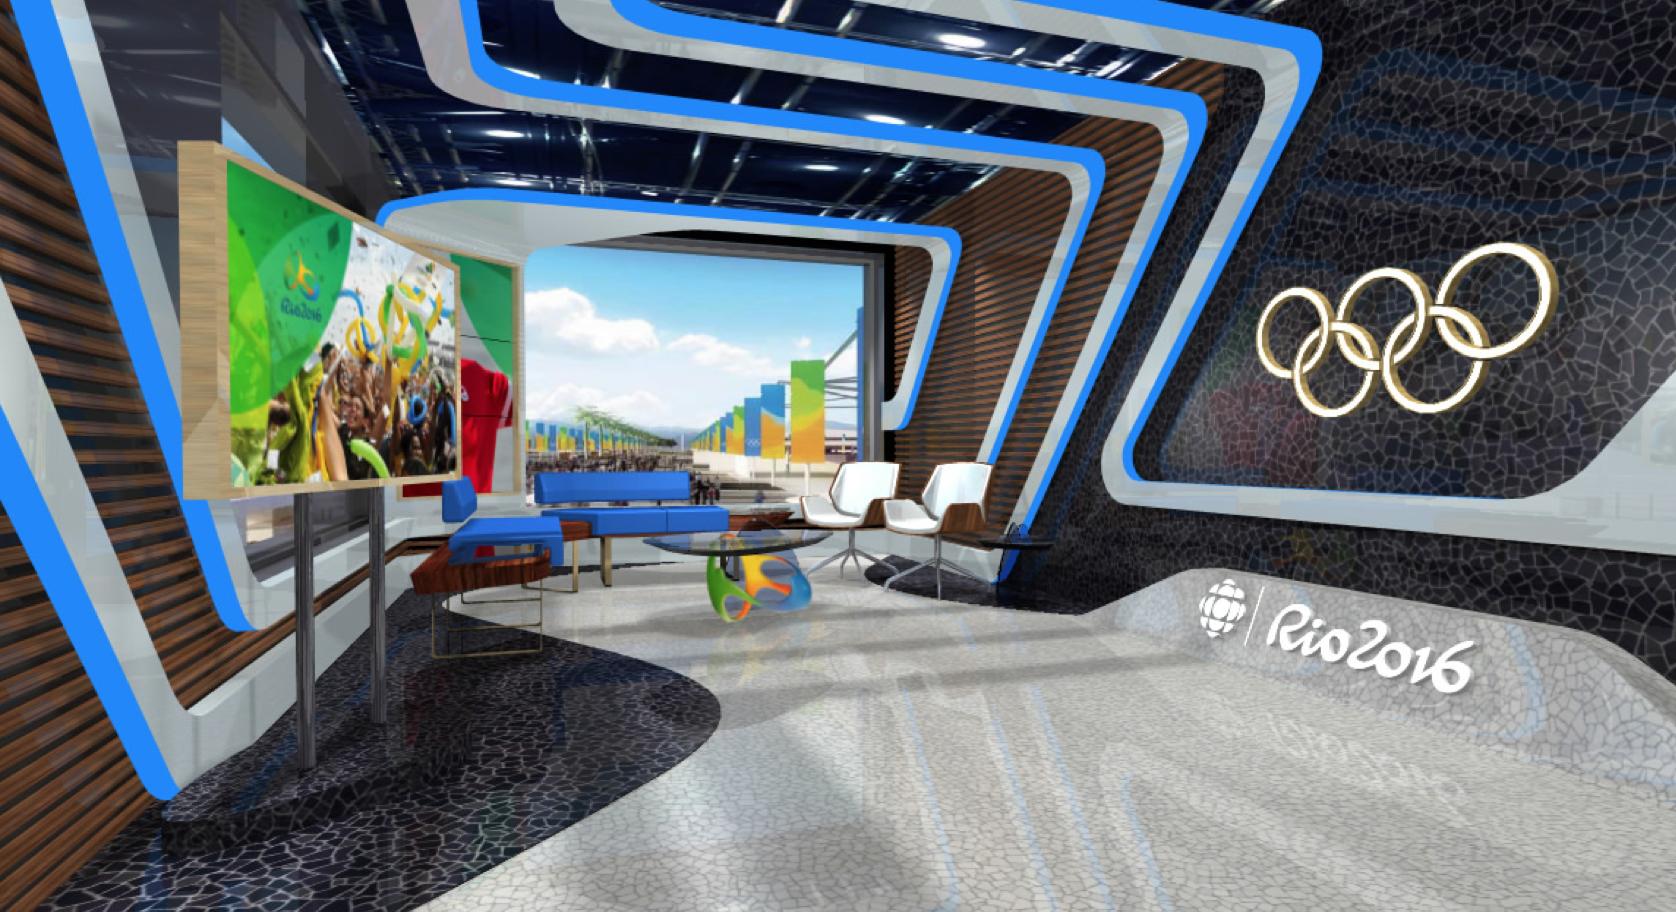 ncs_CBC-Rio-Olympics-TV-Studio_0011